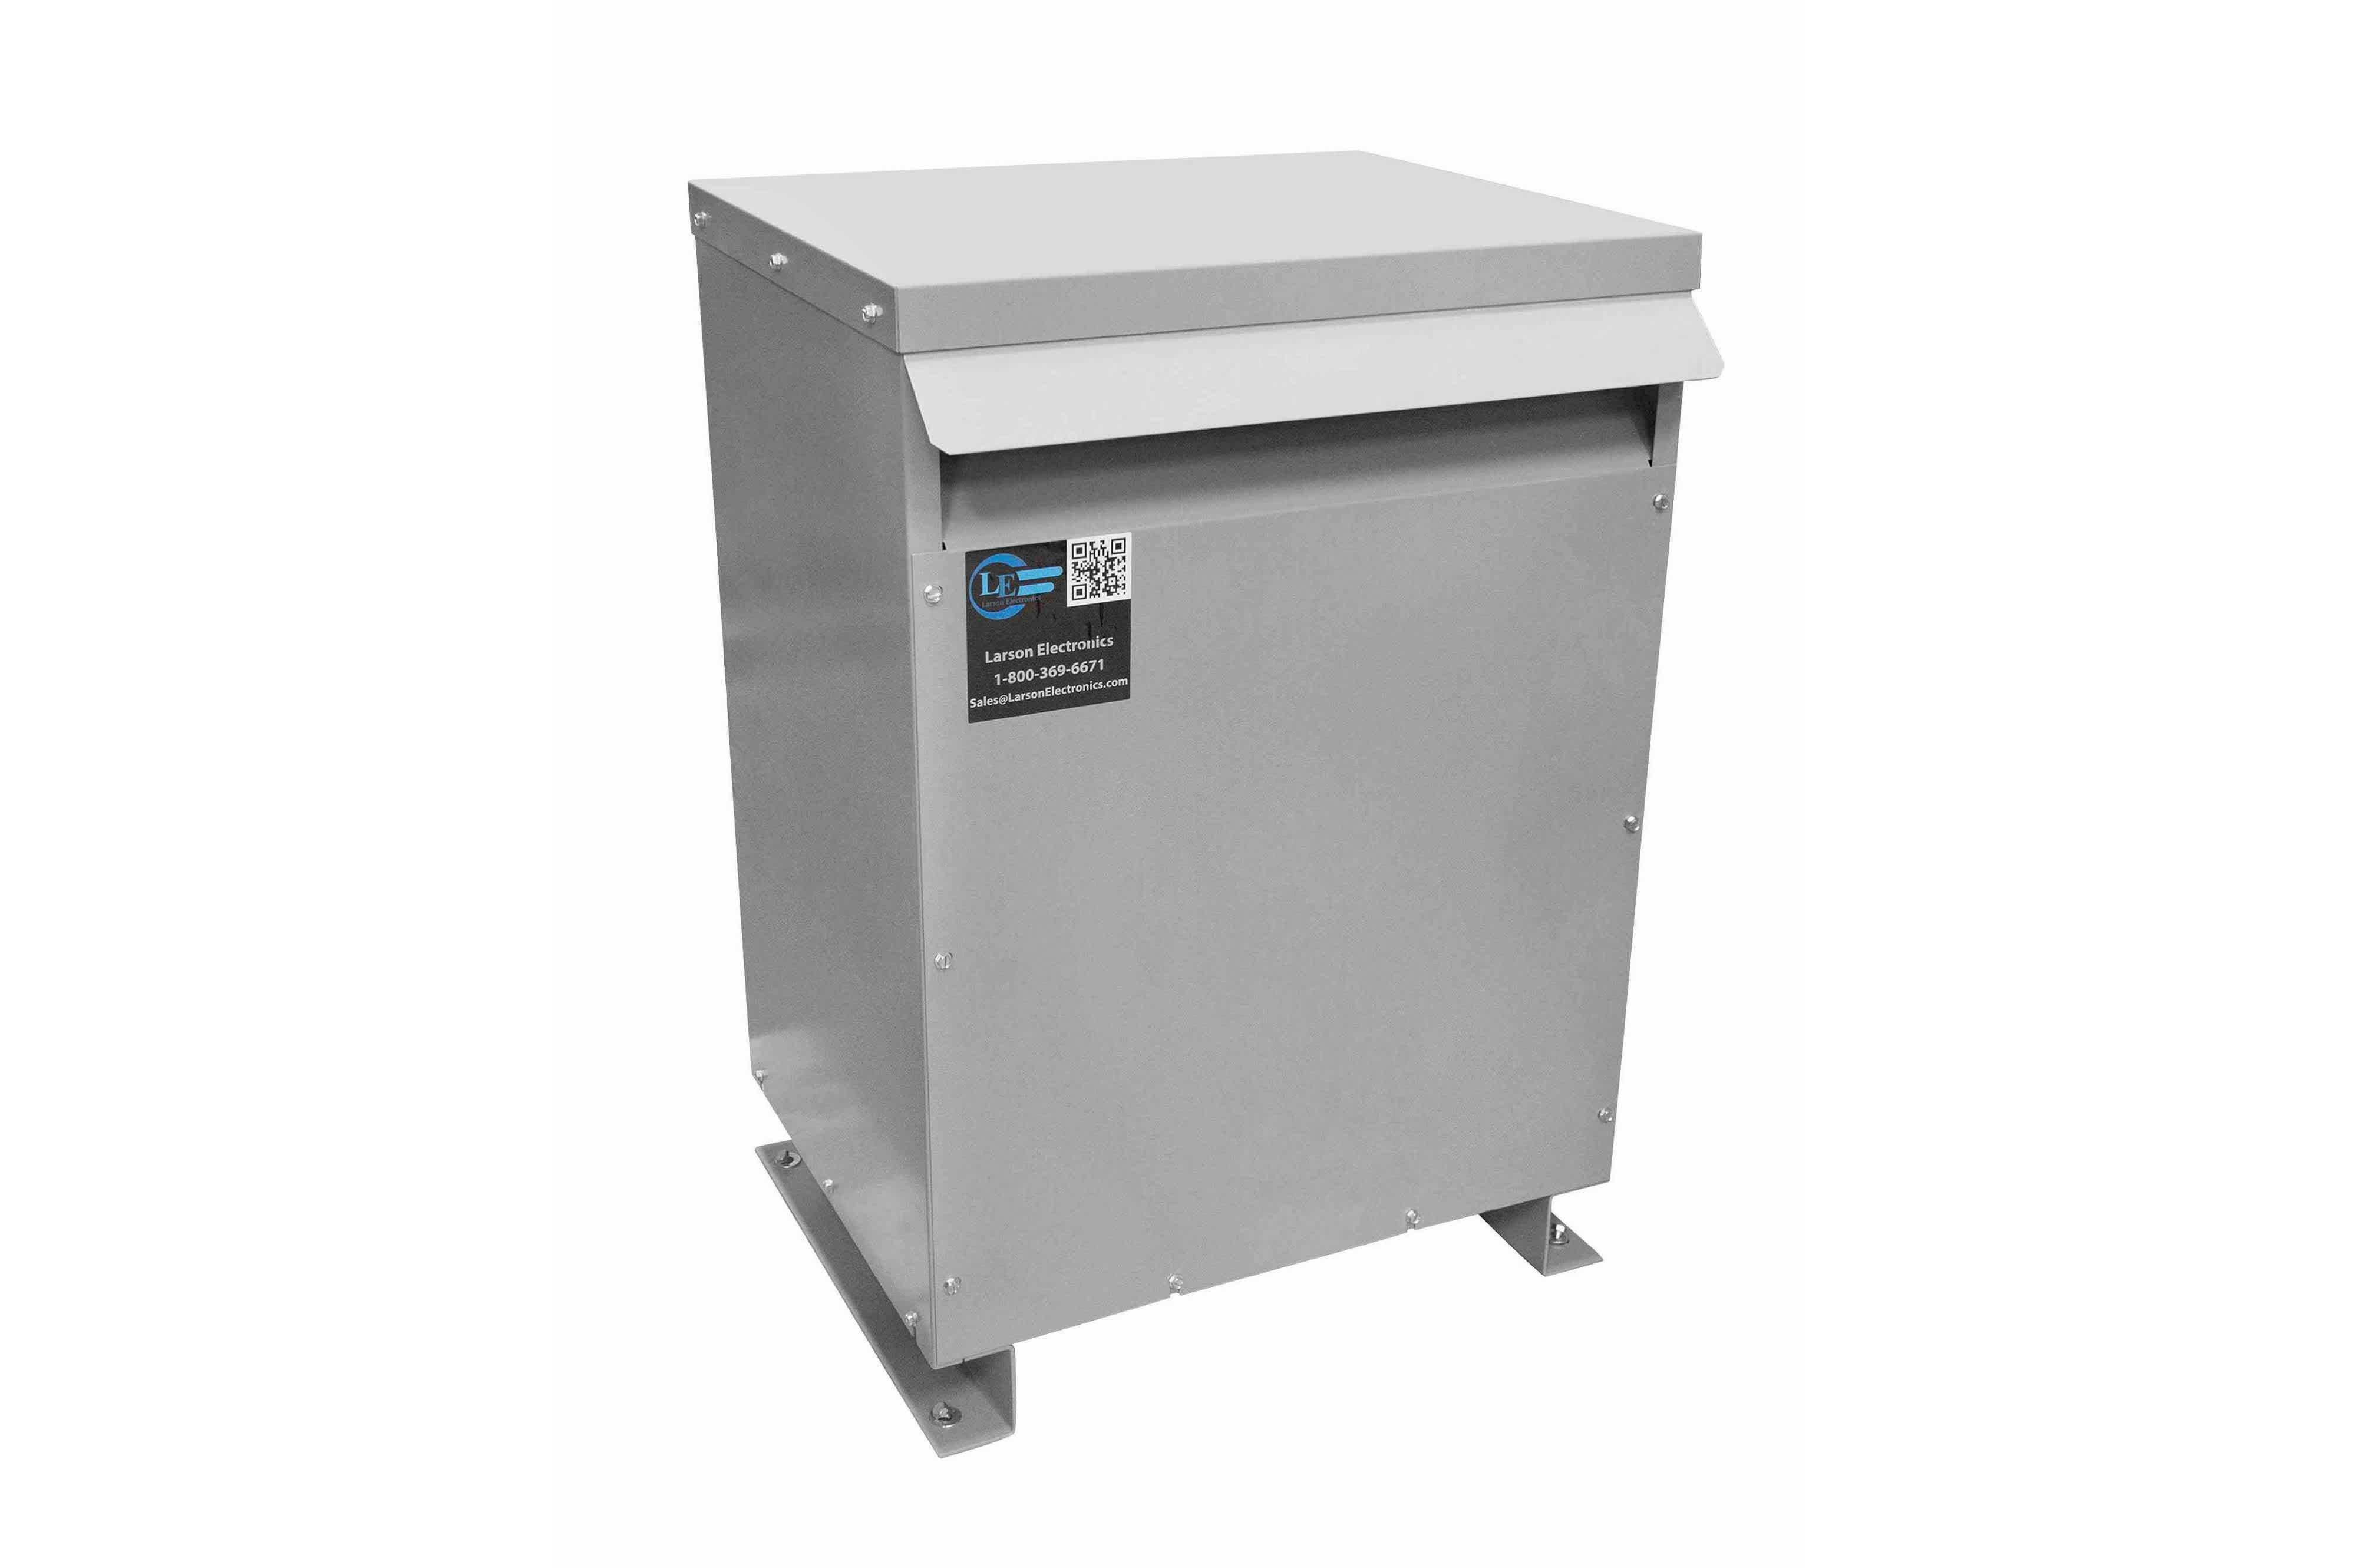 200 kVA 3PH Isolation Transformer, 400V Wye Primary, 480Y/277 Wye-N Secondary, N3R, Ventilated, 60 Hz